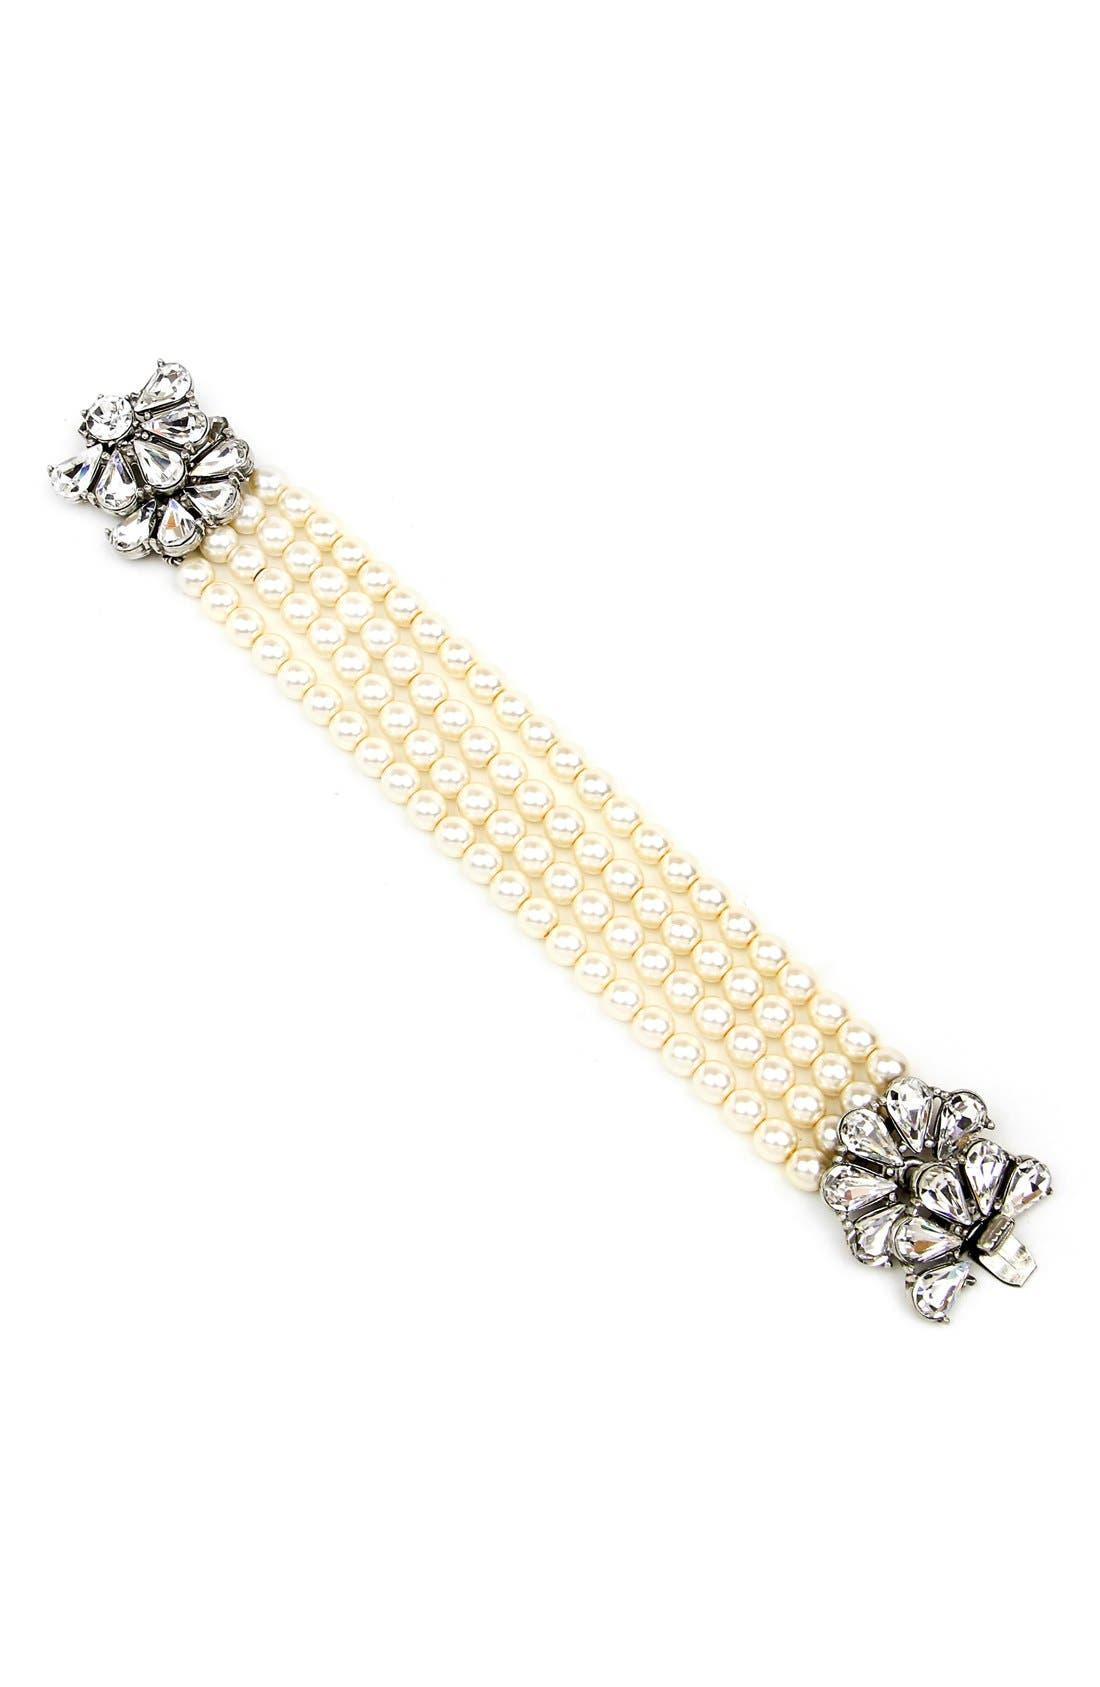 Alternate Image 1 Selected - Ben-Amun Crystal & Faux Pearl Strand Bracelet